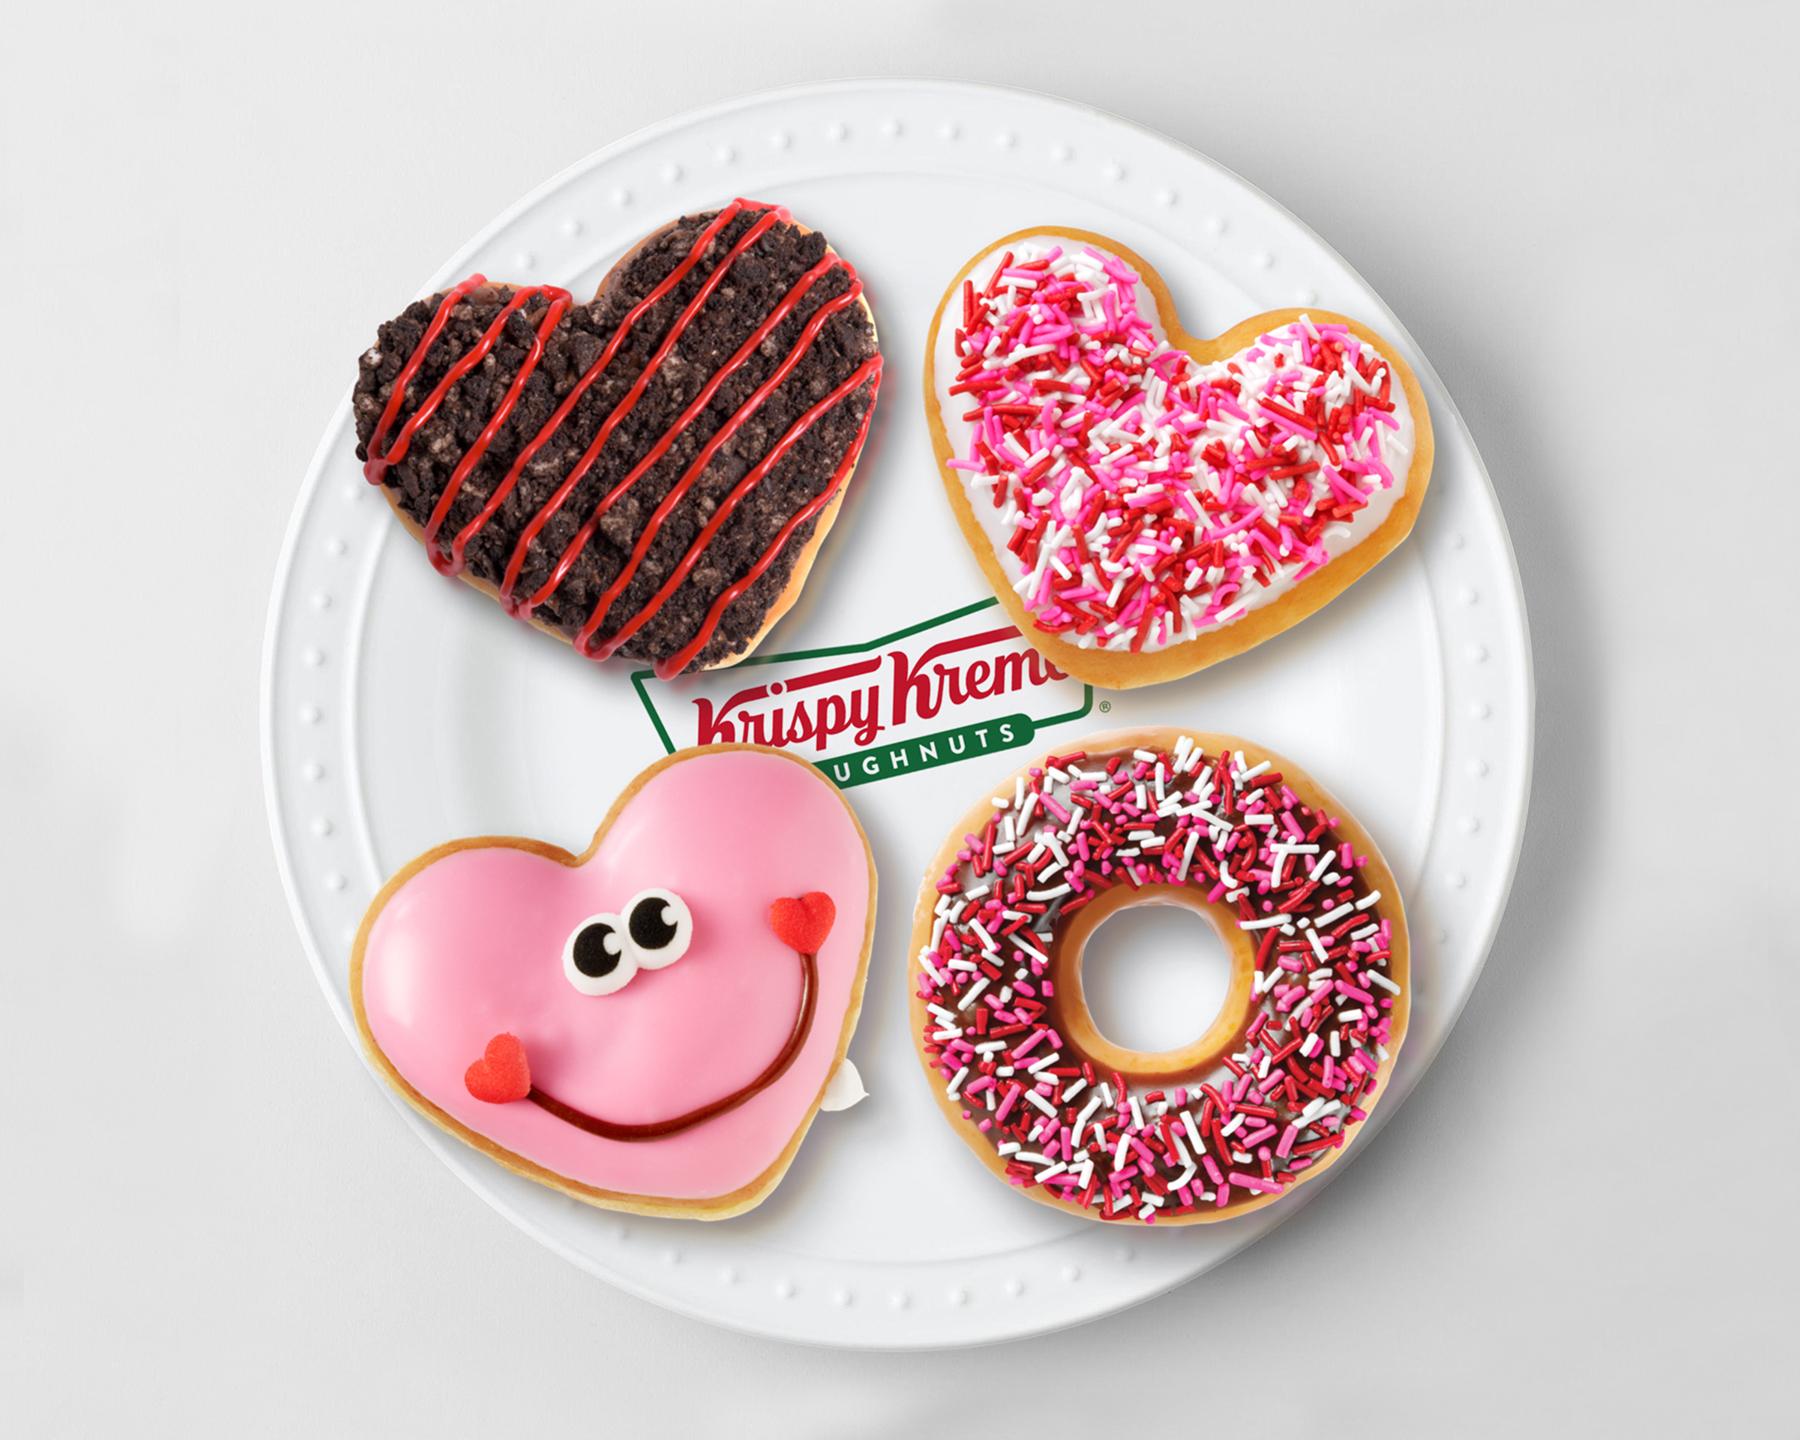 Krispy Kreme Valentine's Day doughnuts.